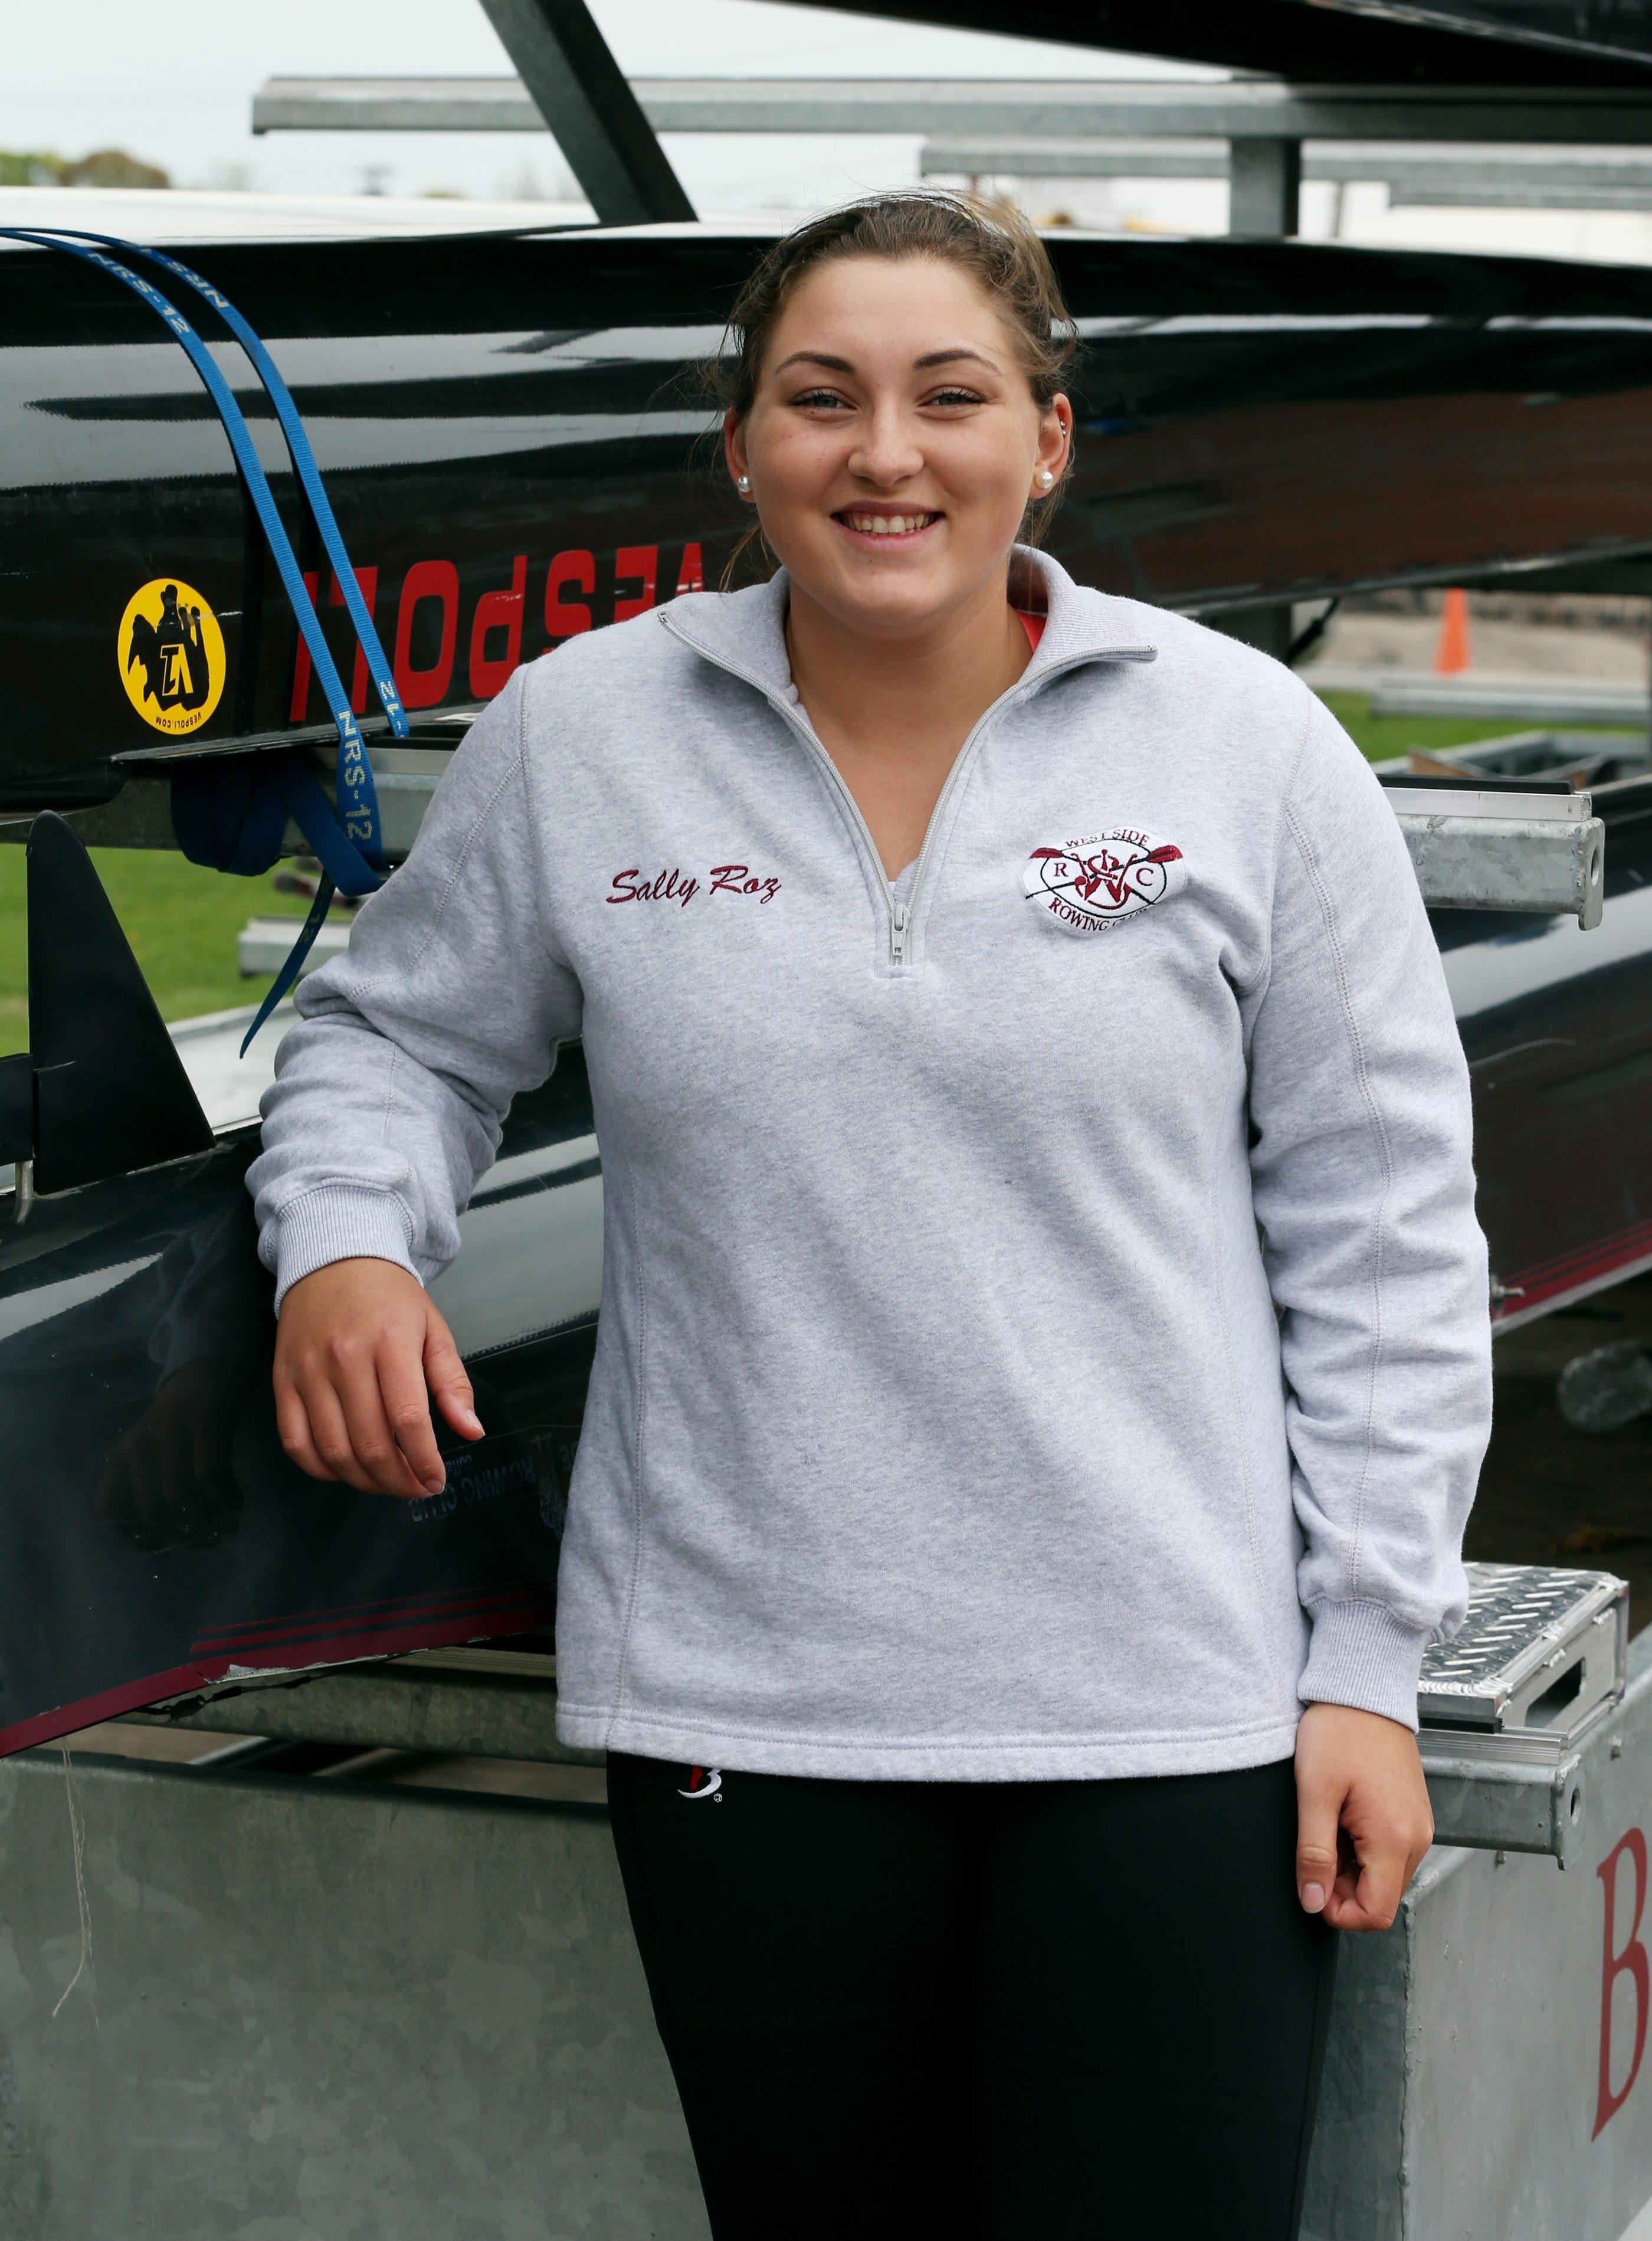 Niagara-Wheatfield's Sally Rozumalski turned curiosity into a Division I scholarship at Louisville.